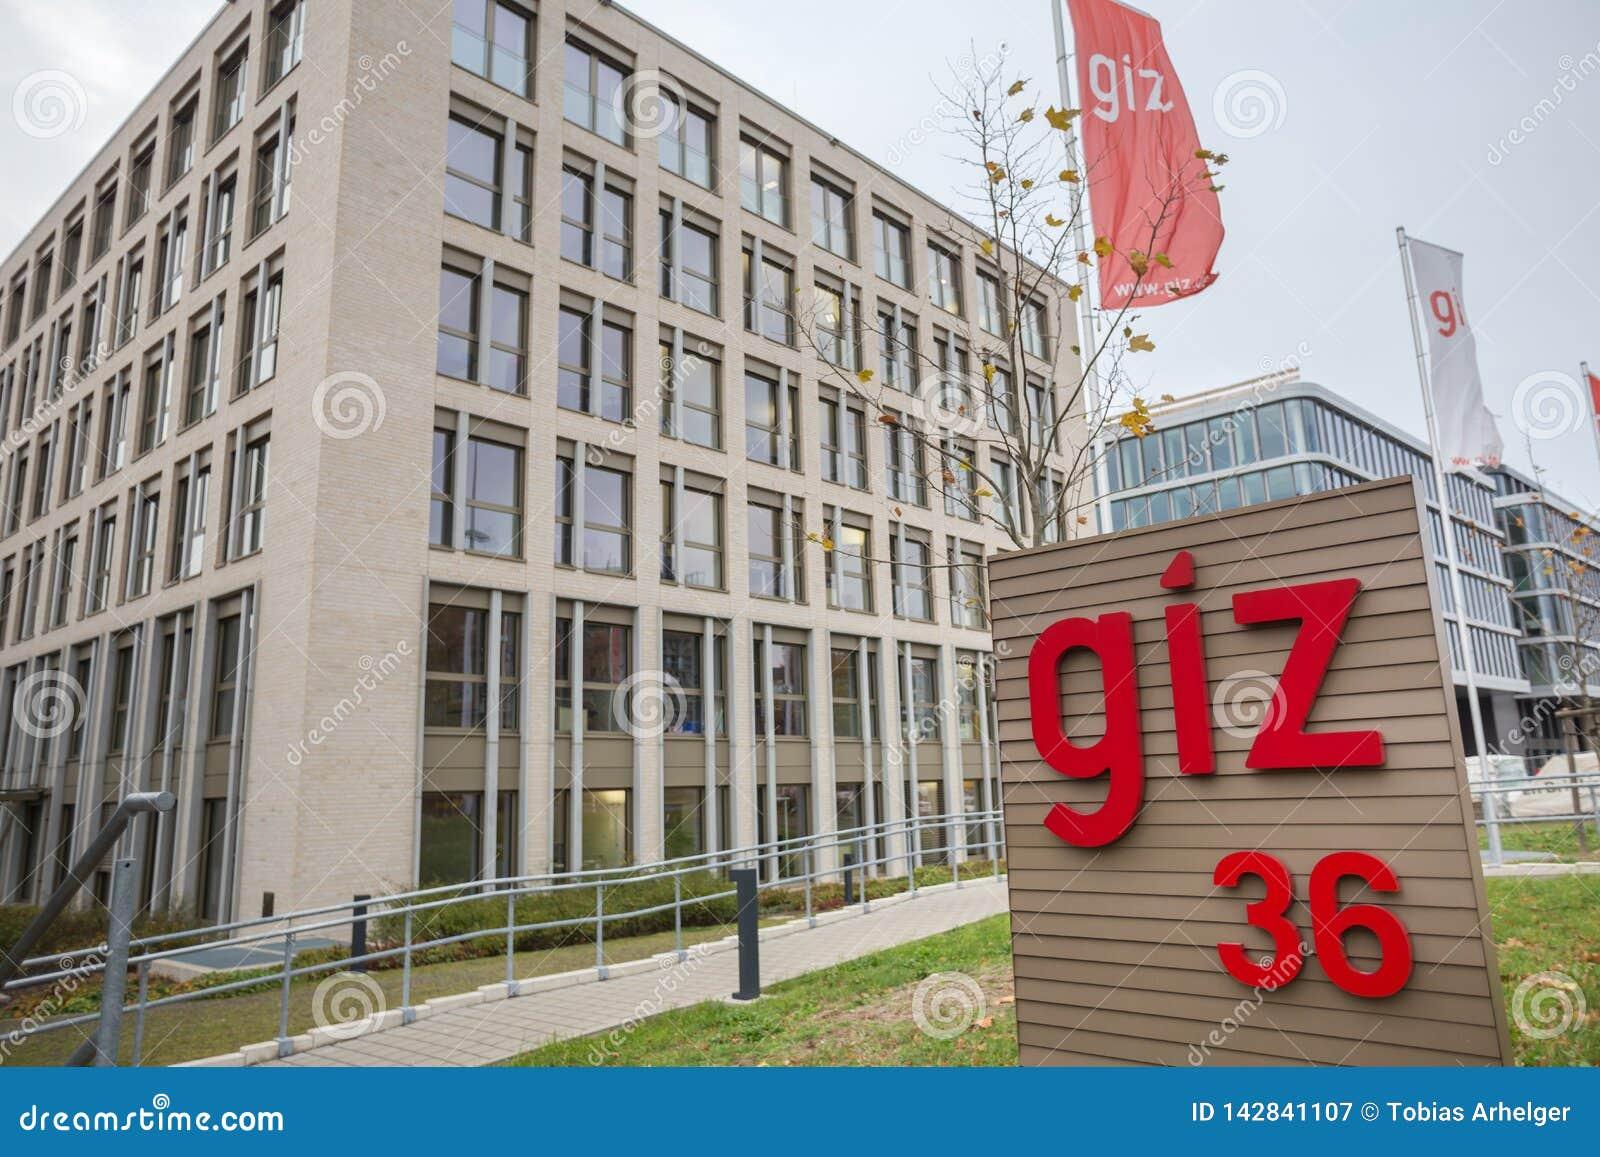 Giz budynek w Bonn Germany